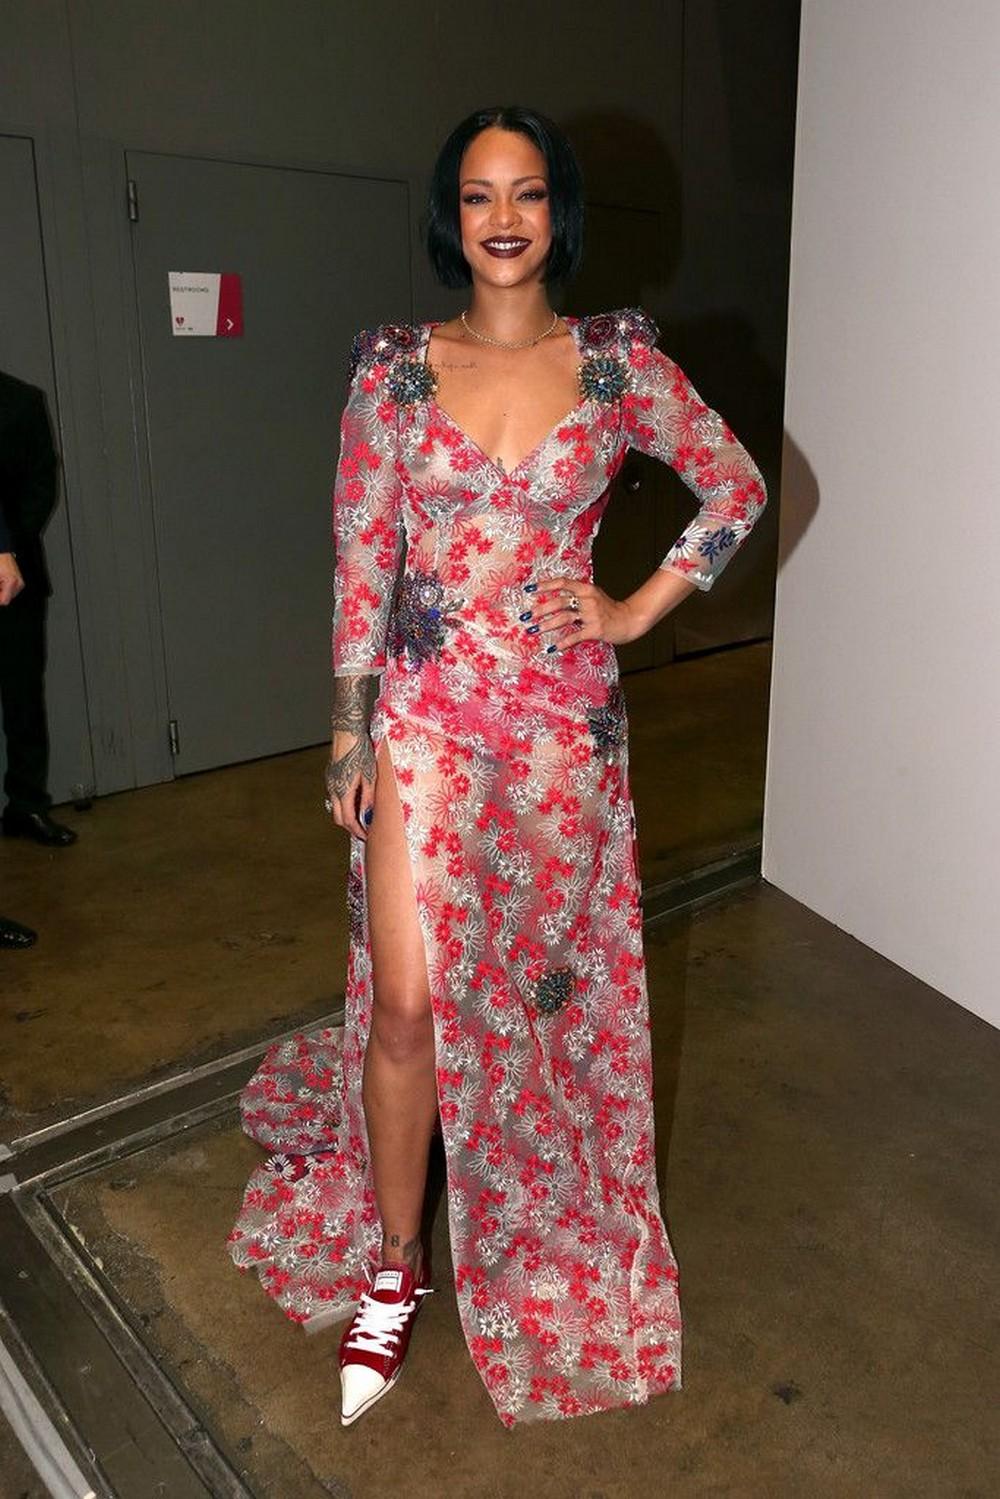 Rihanna peoplecom cfapreparationfo rihanna imdb voltagebd Gallery